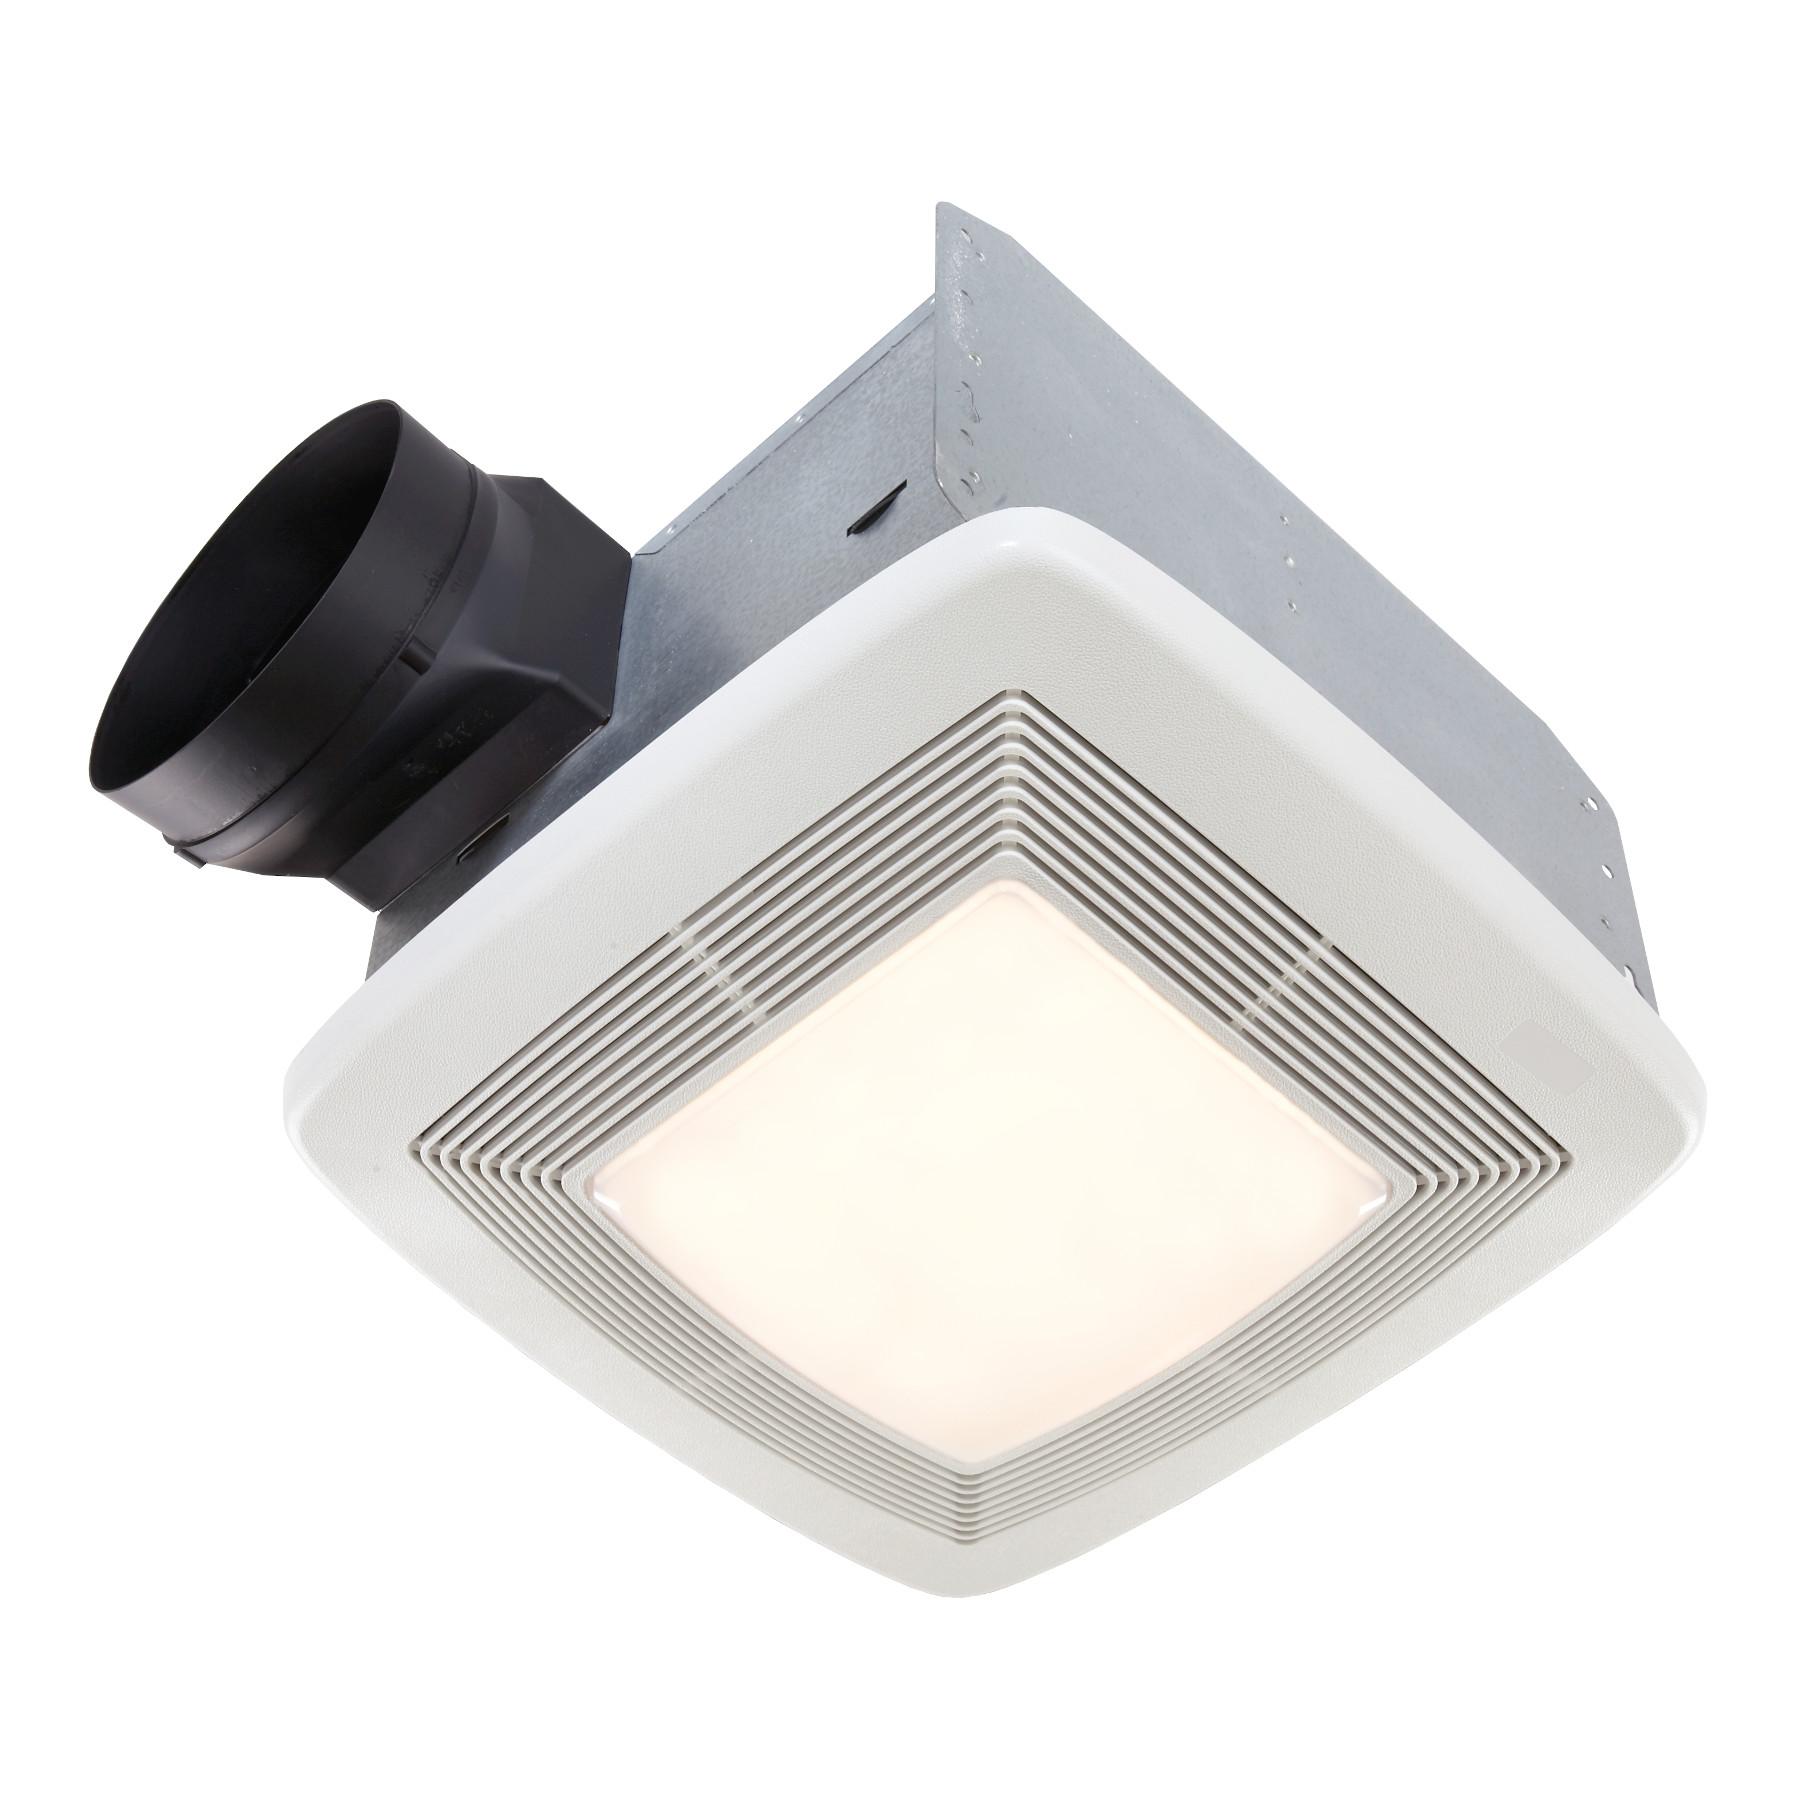 110 Cfm Ventilation Fan Light, Bathroom Exhaust Fan With Light And Nightlight